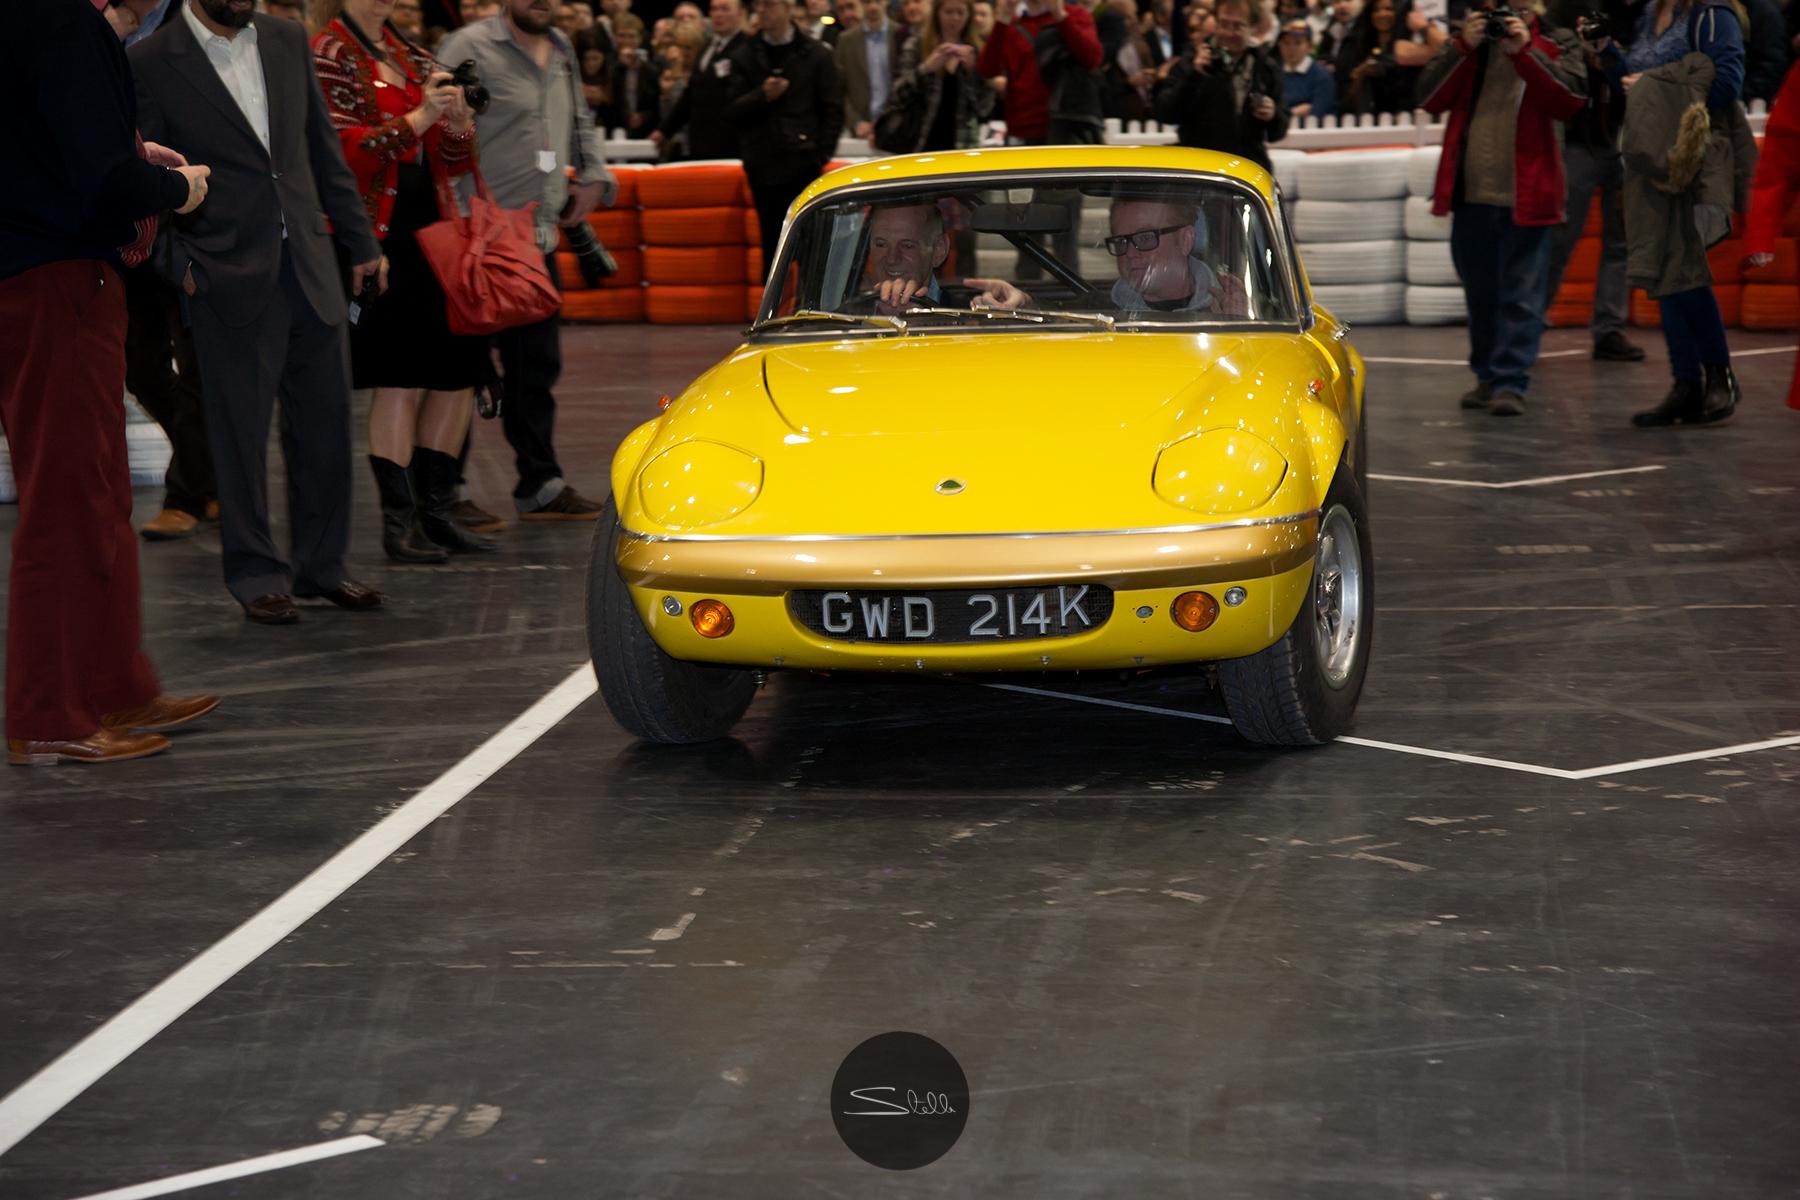 Stella Scordellis London Classic Car Show 2015 7 Watermarked.jpg